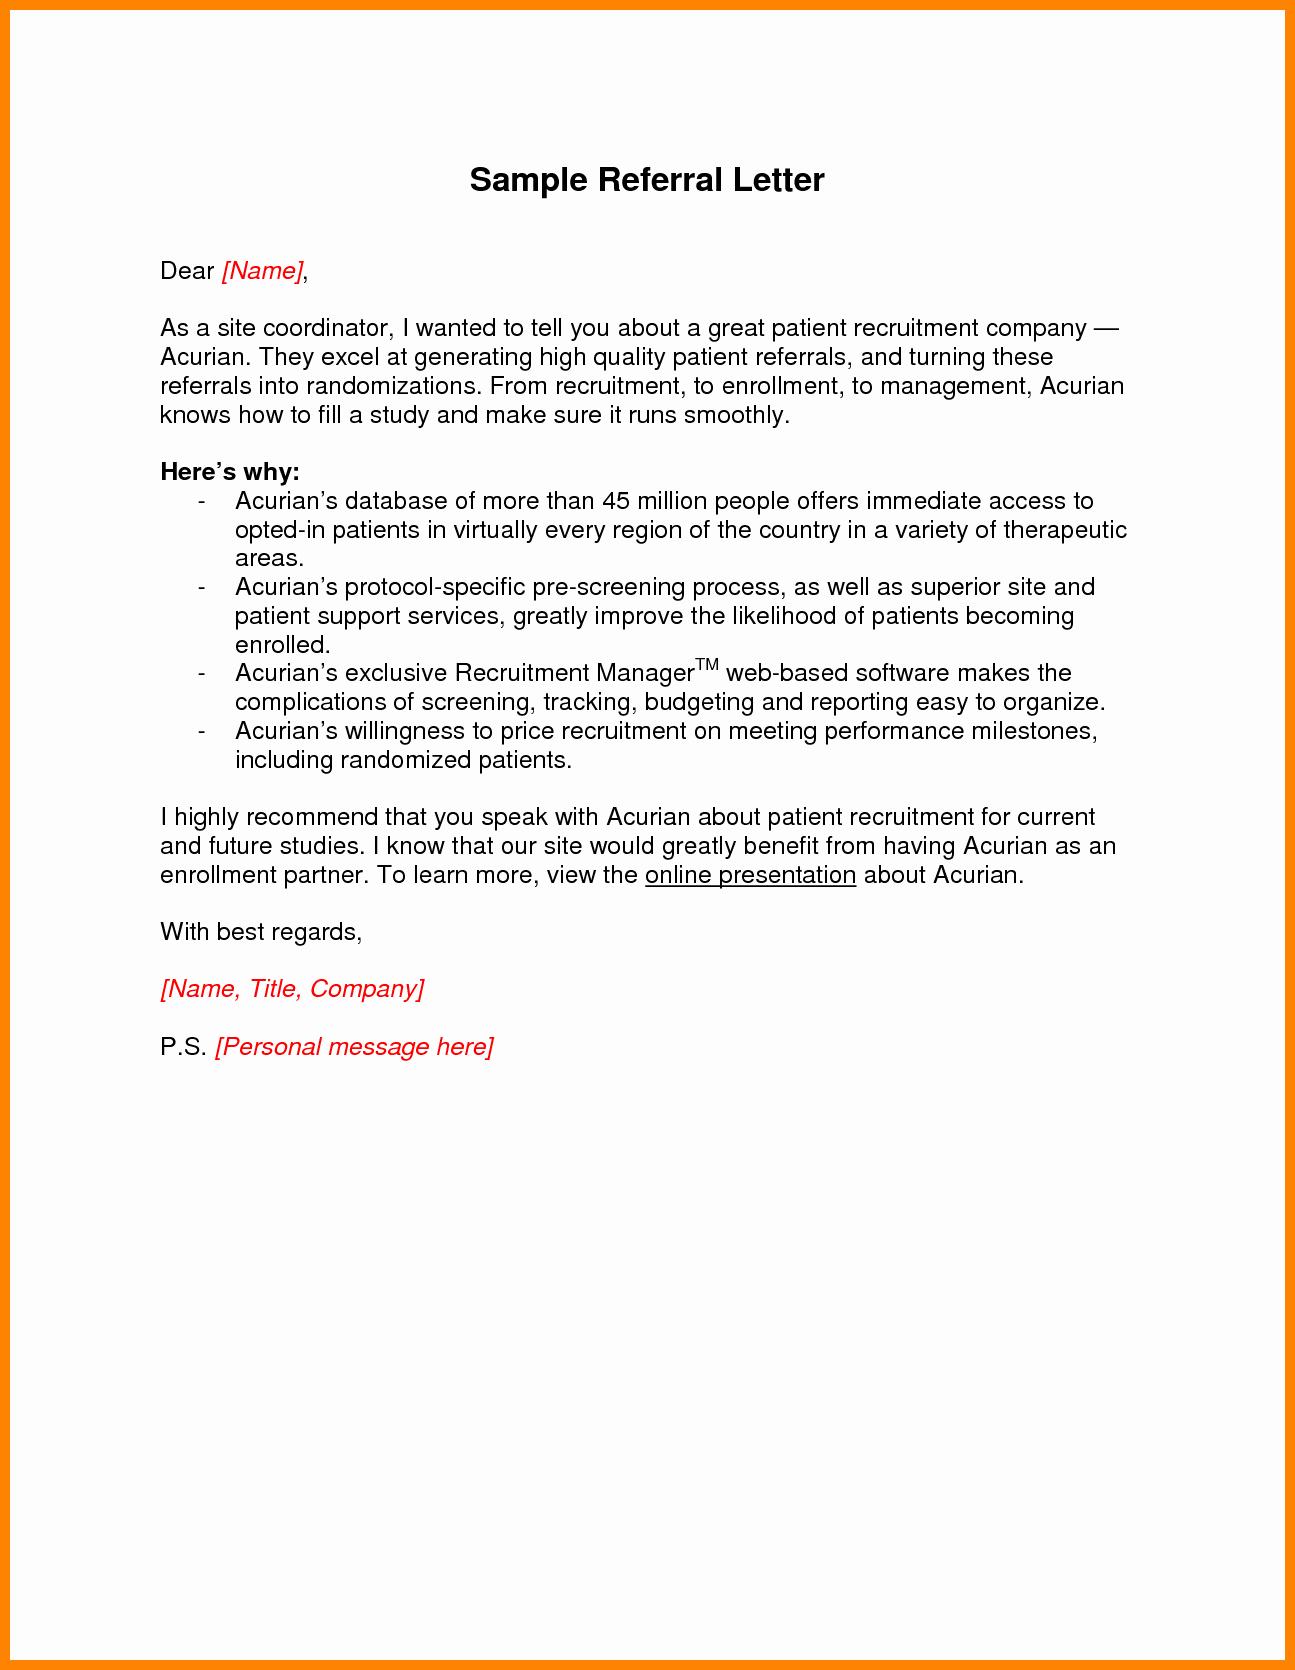 Letter asking for Referrals From Medical Professionals Fresh Sample Medical Referral Letters Cover Letter Samples